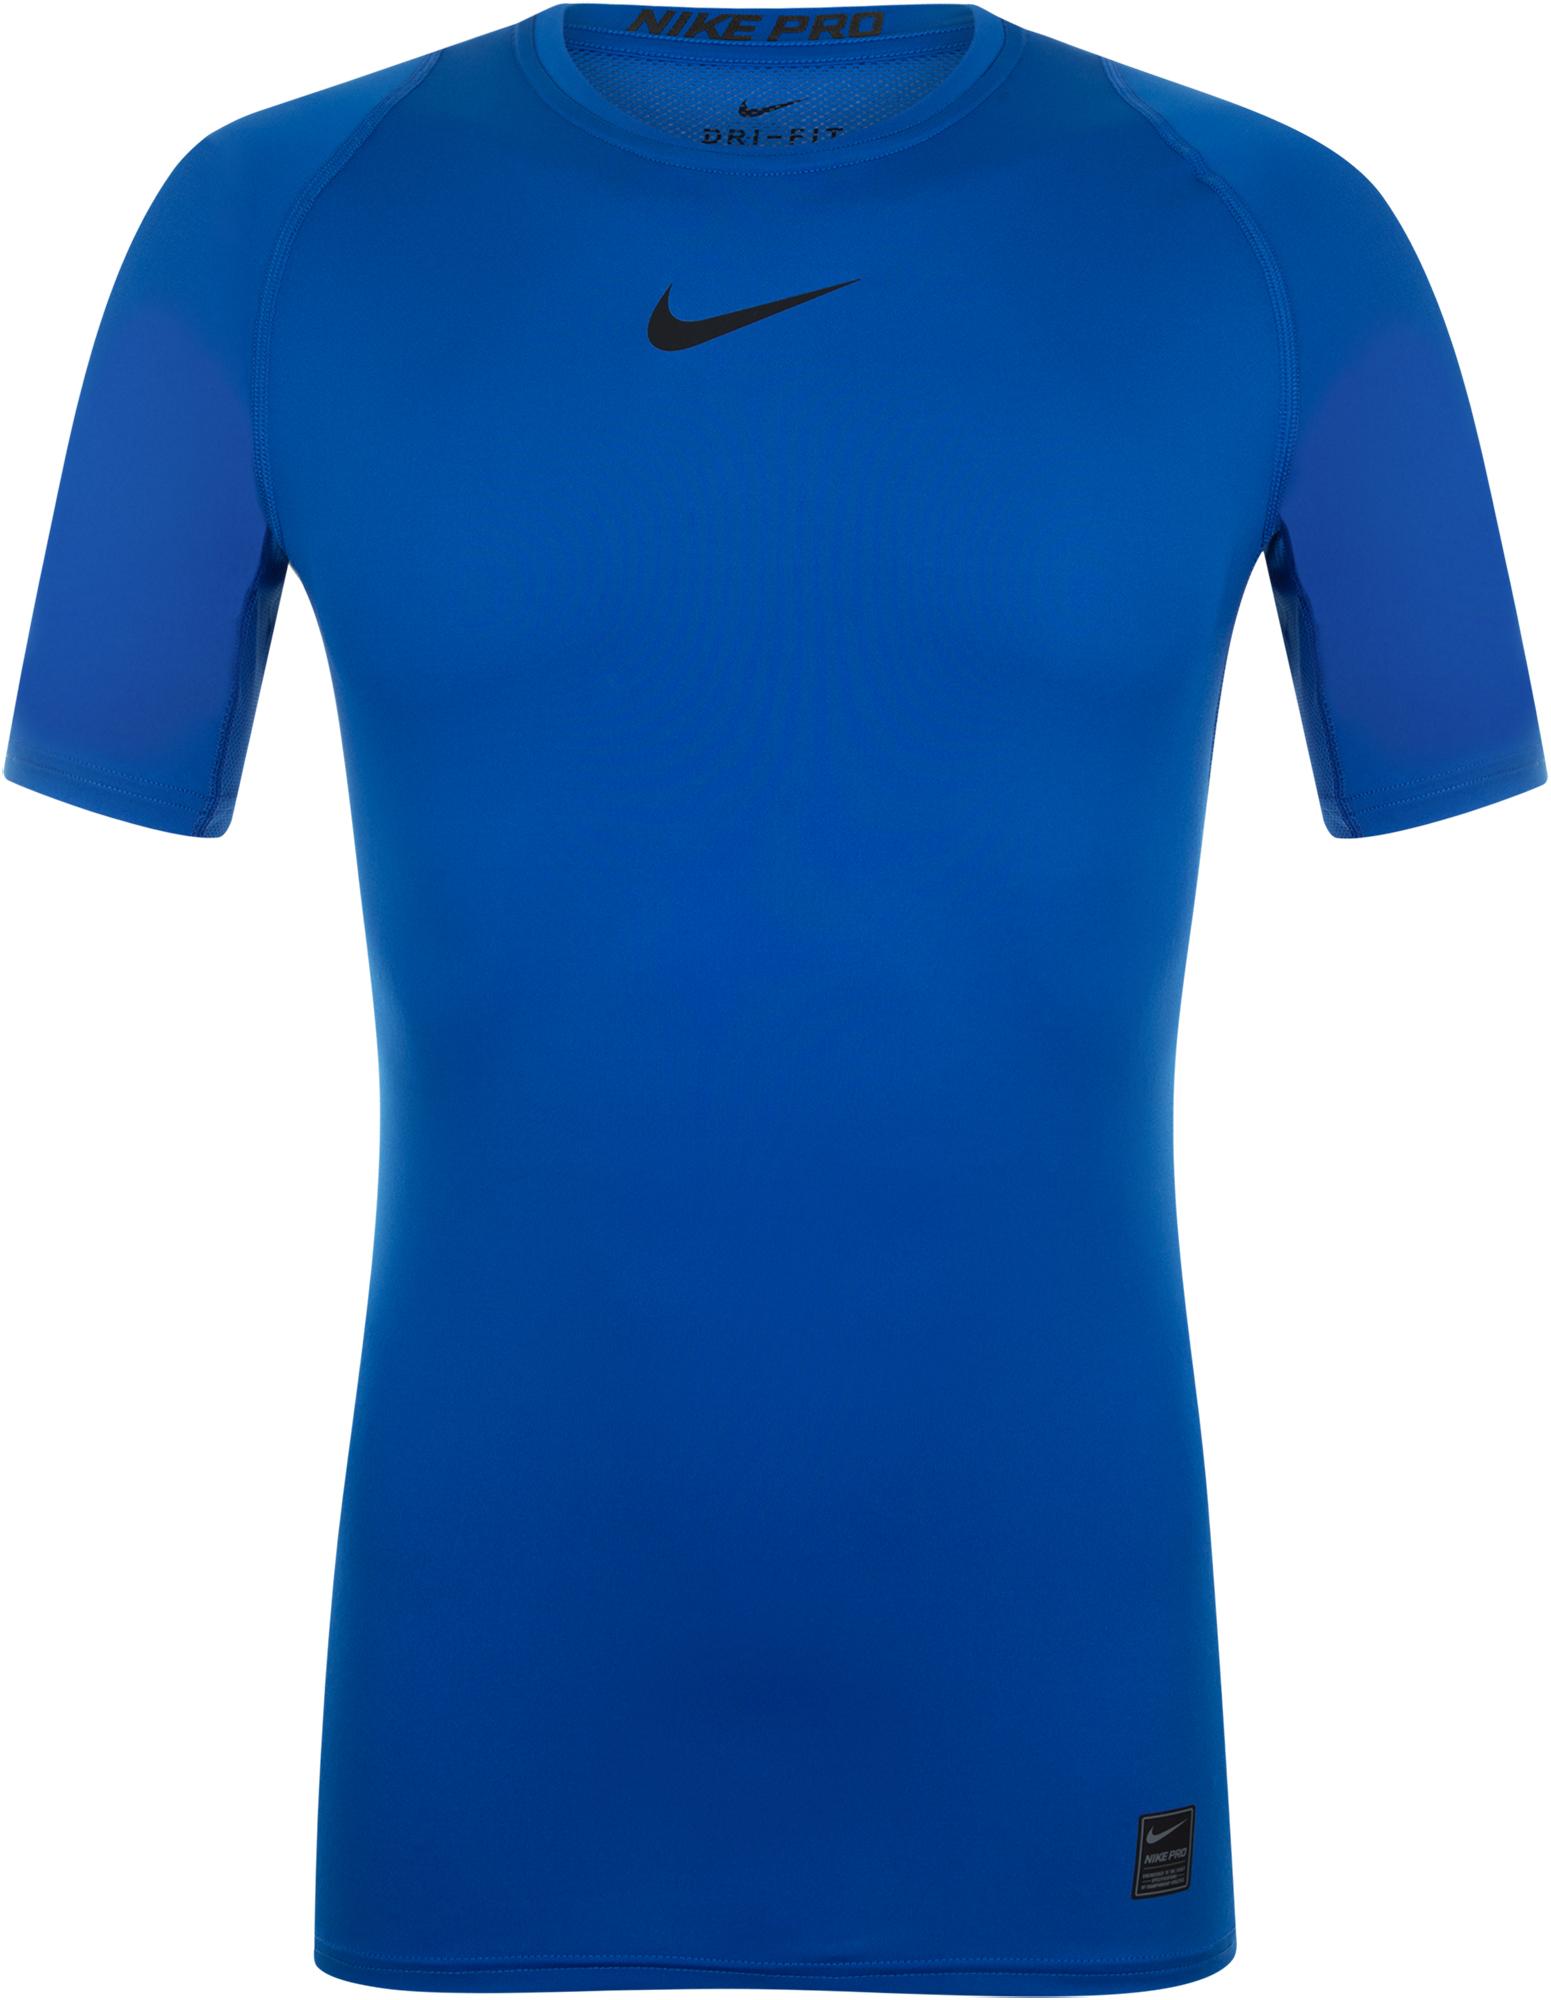 Nike Футболка мужская Pro, размер 50-52